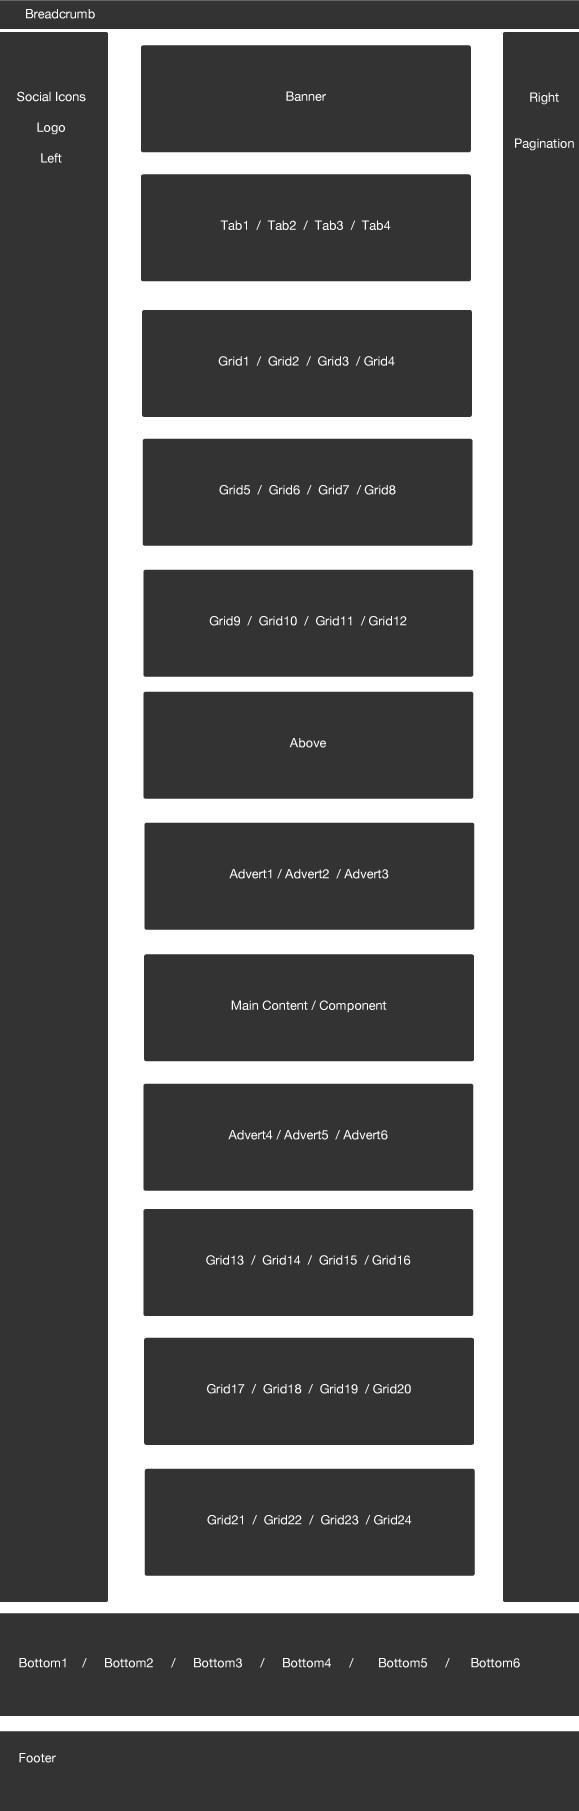 Pinterest Inspired Joomla 2.5 Template - Platform Module Positions